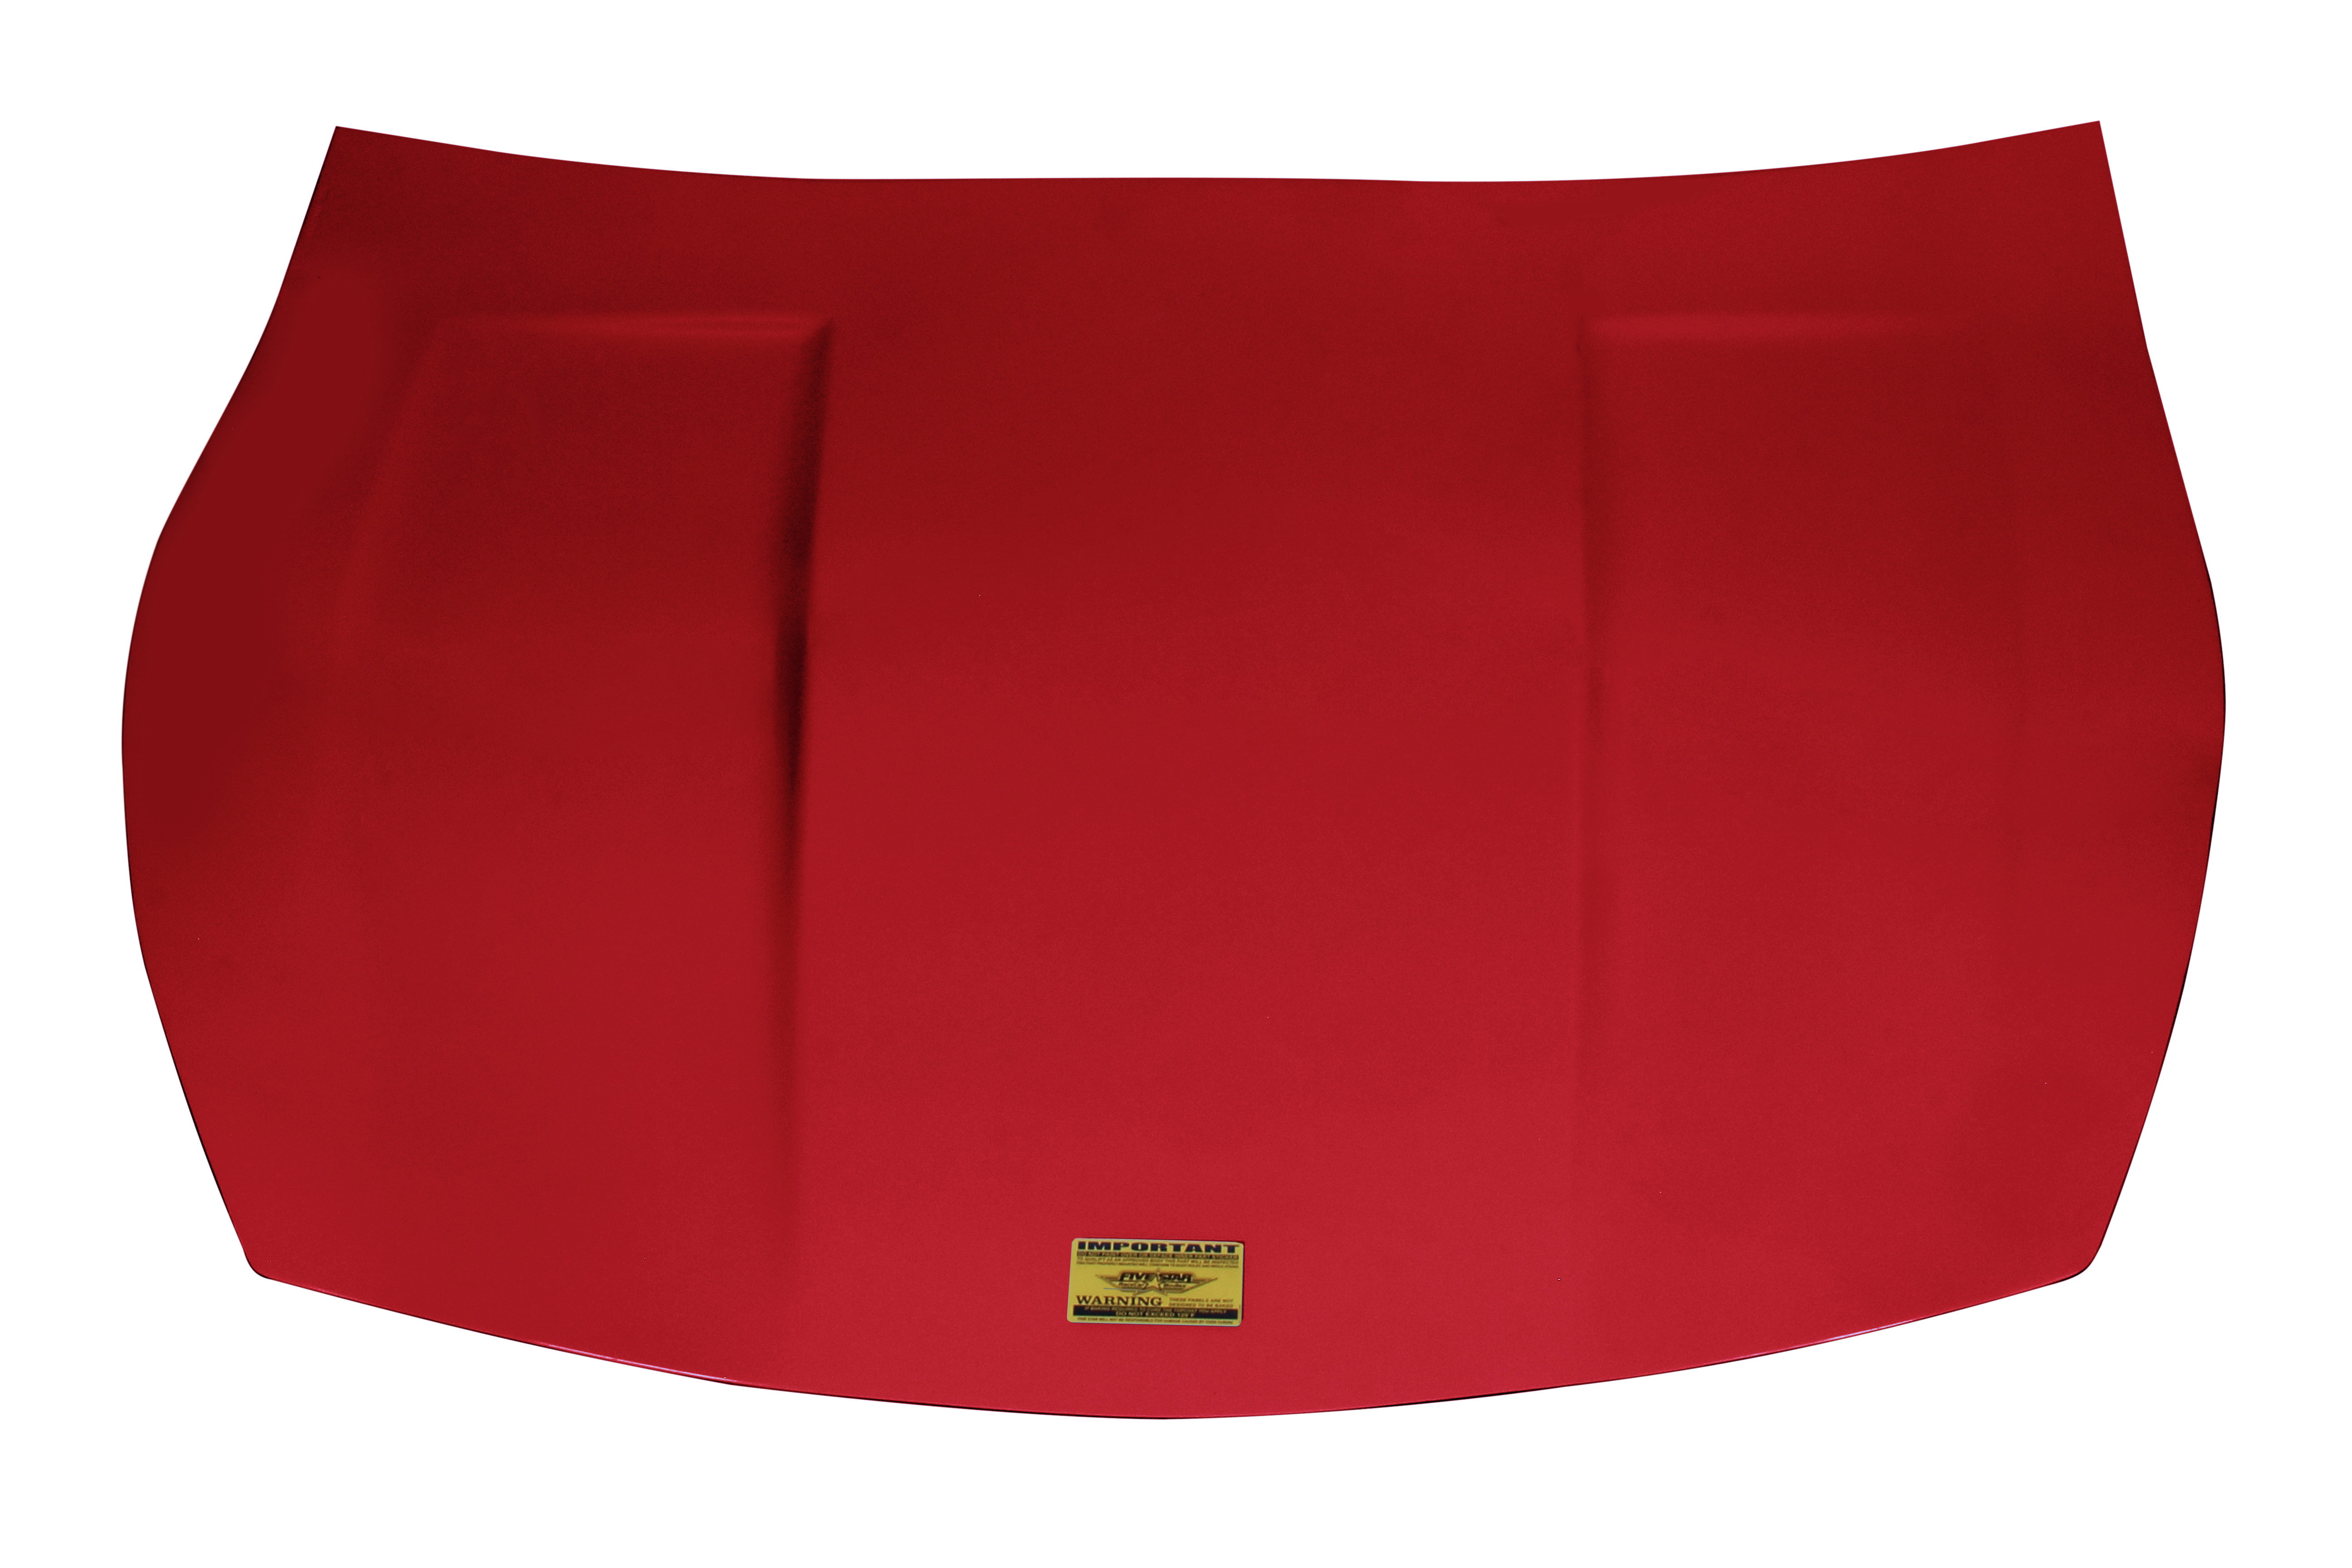 Fivestar 2019 LM Hood Hand Laid Fiberglass Red